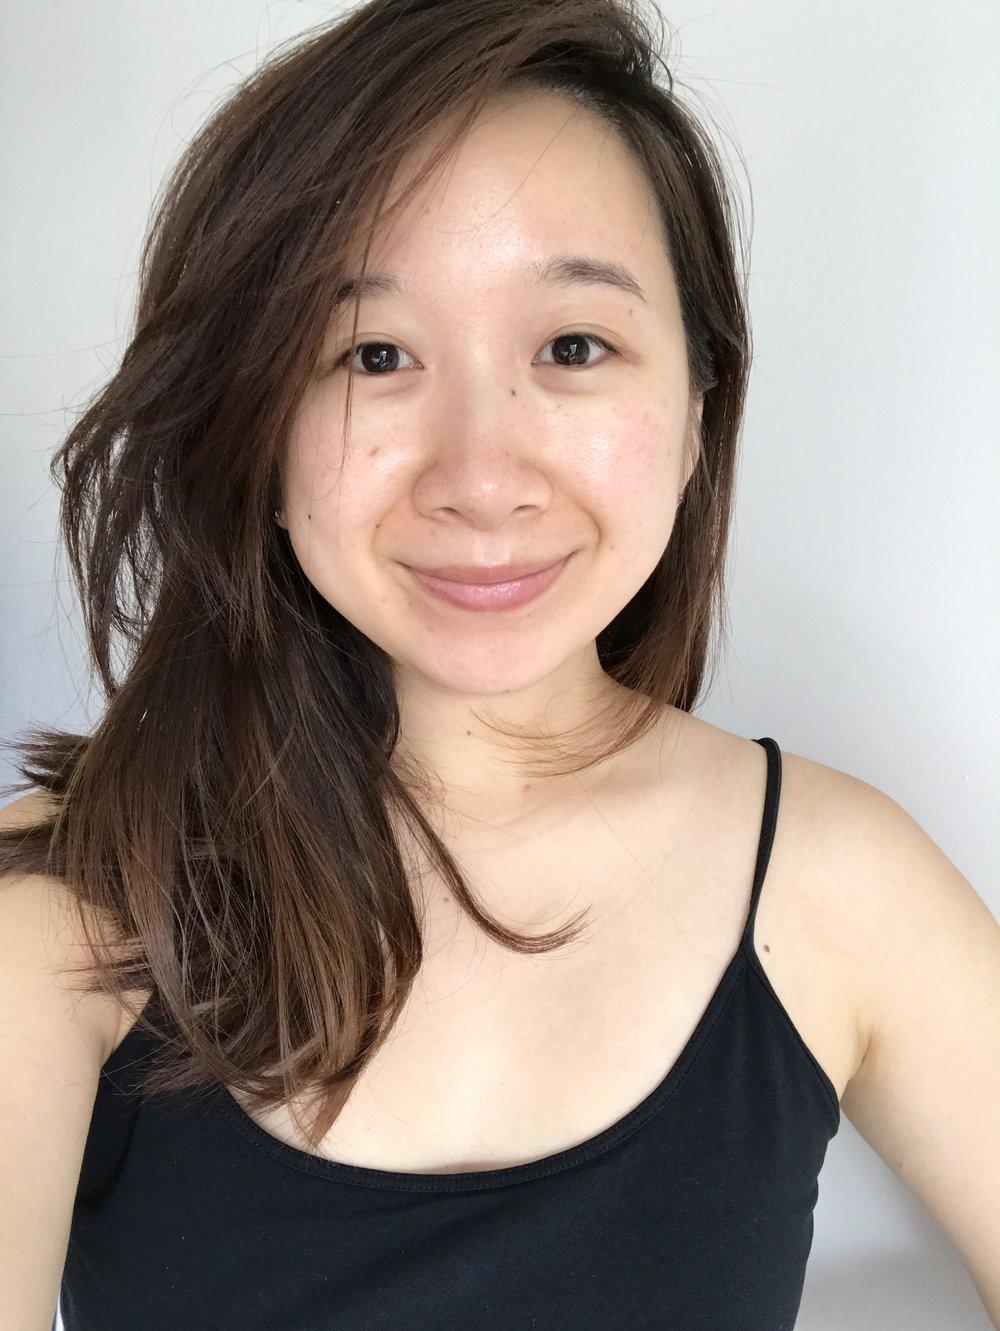 Skin after 7 days.